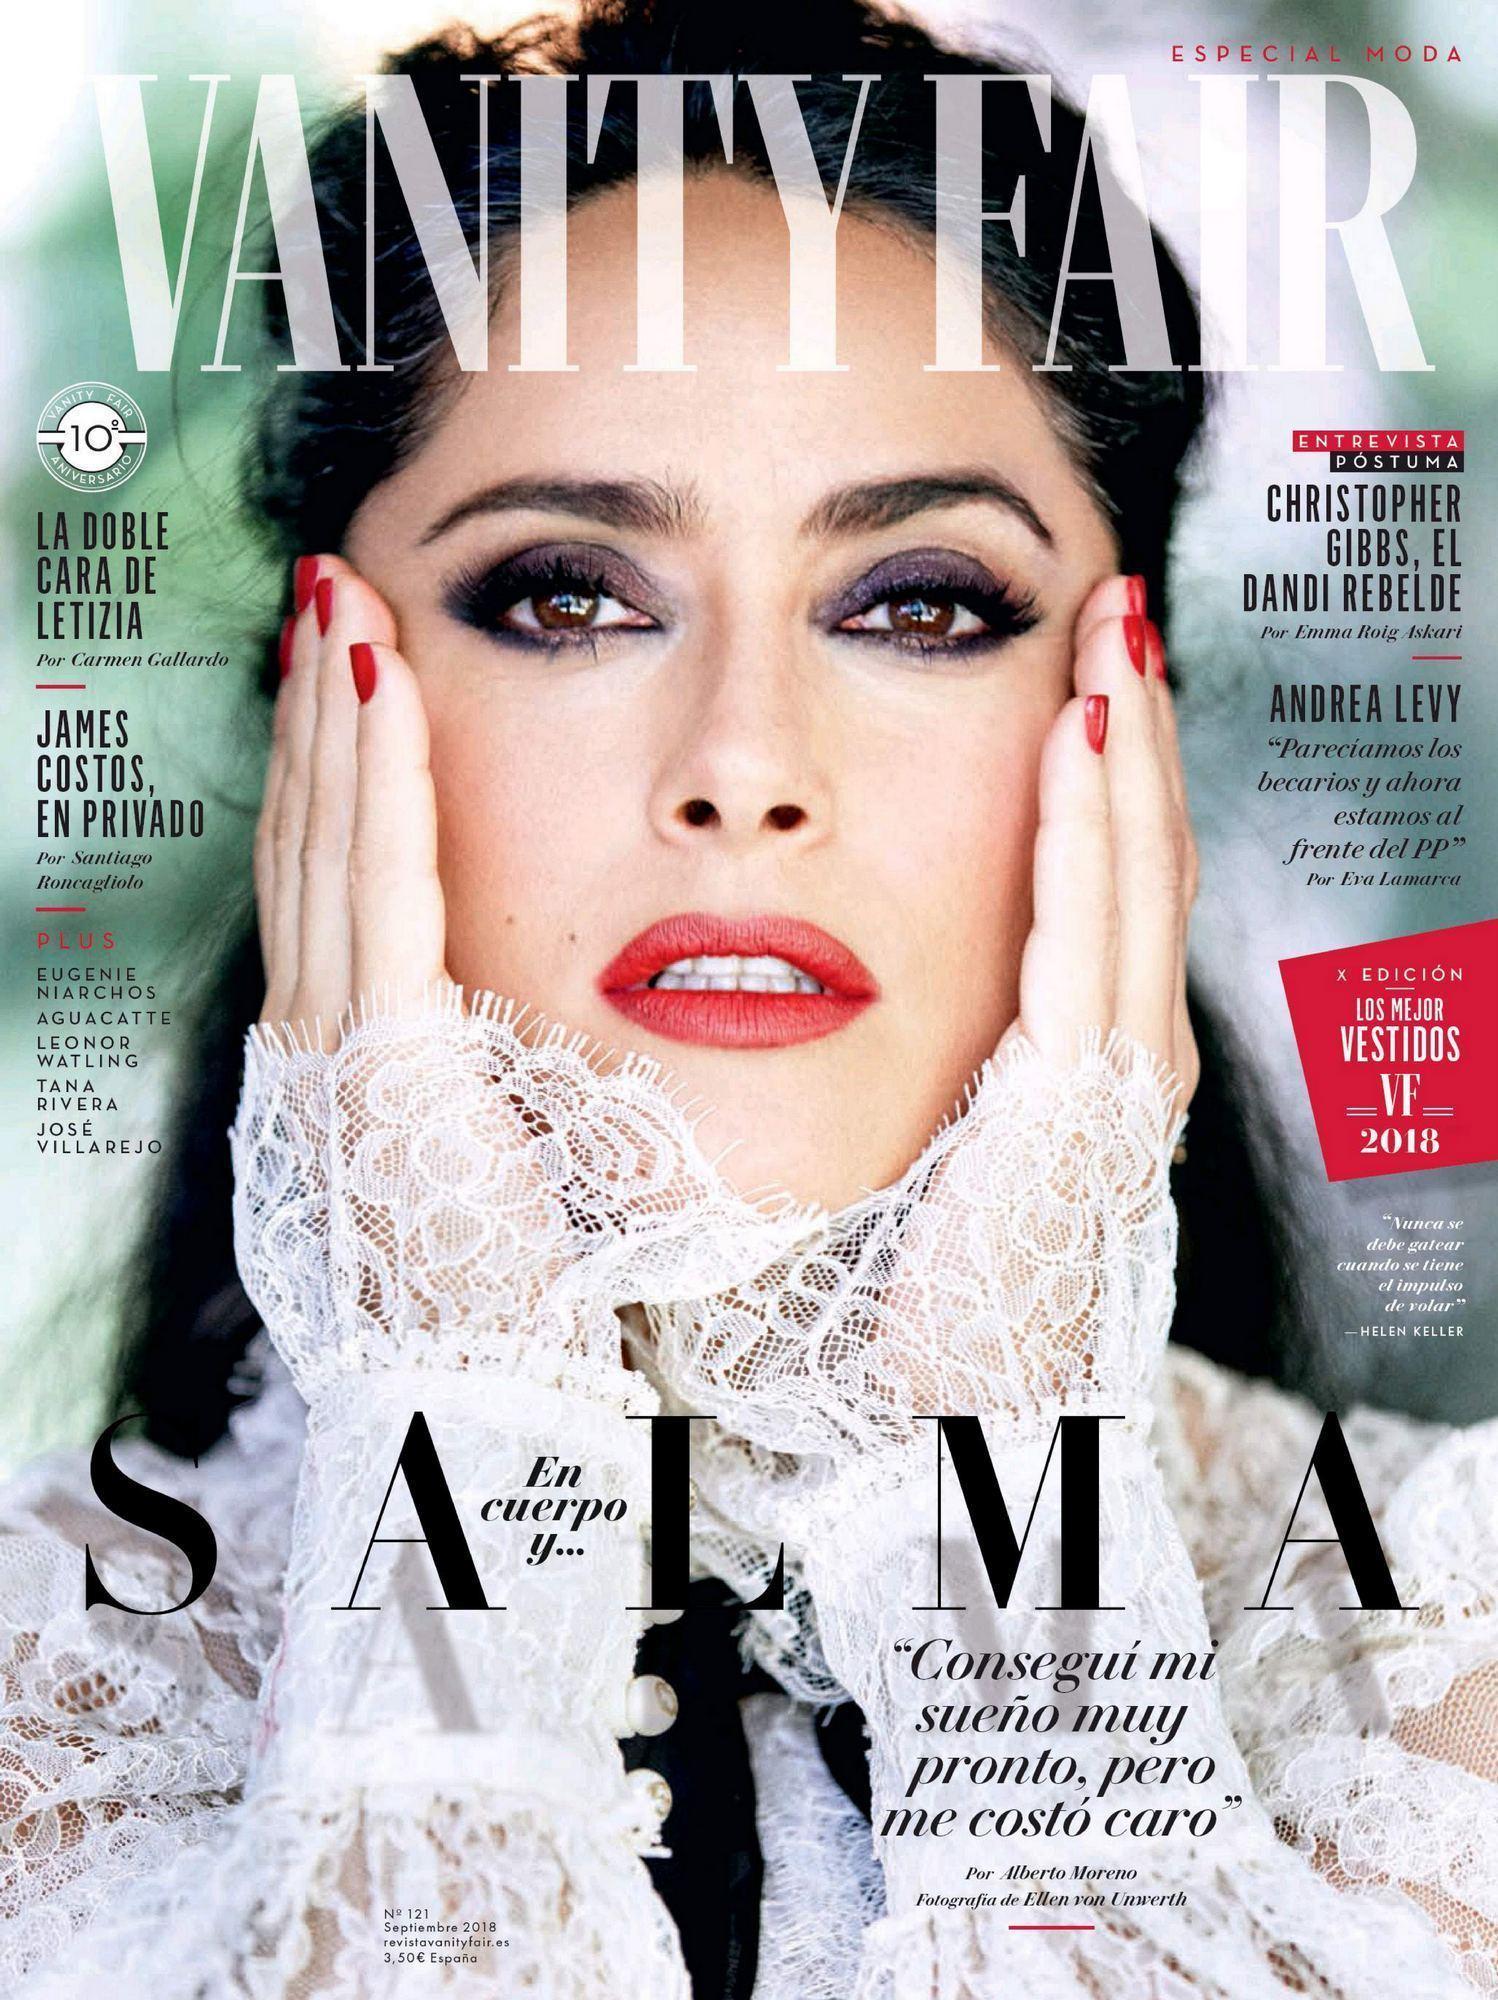 Salma-Hayek-Vanity-Fair-September-2018Salma-Hayek-Vanity-Fair-September-2018c913d6953200714.jpg